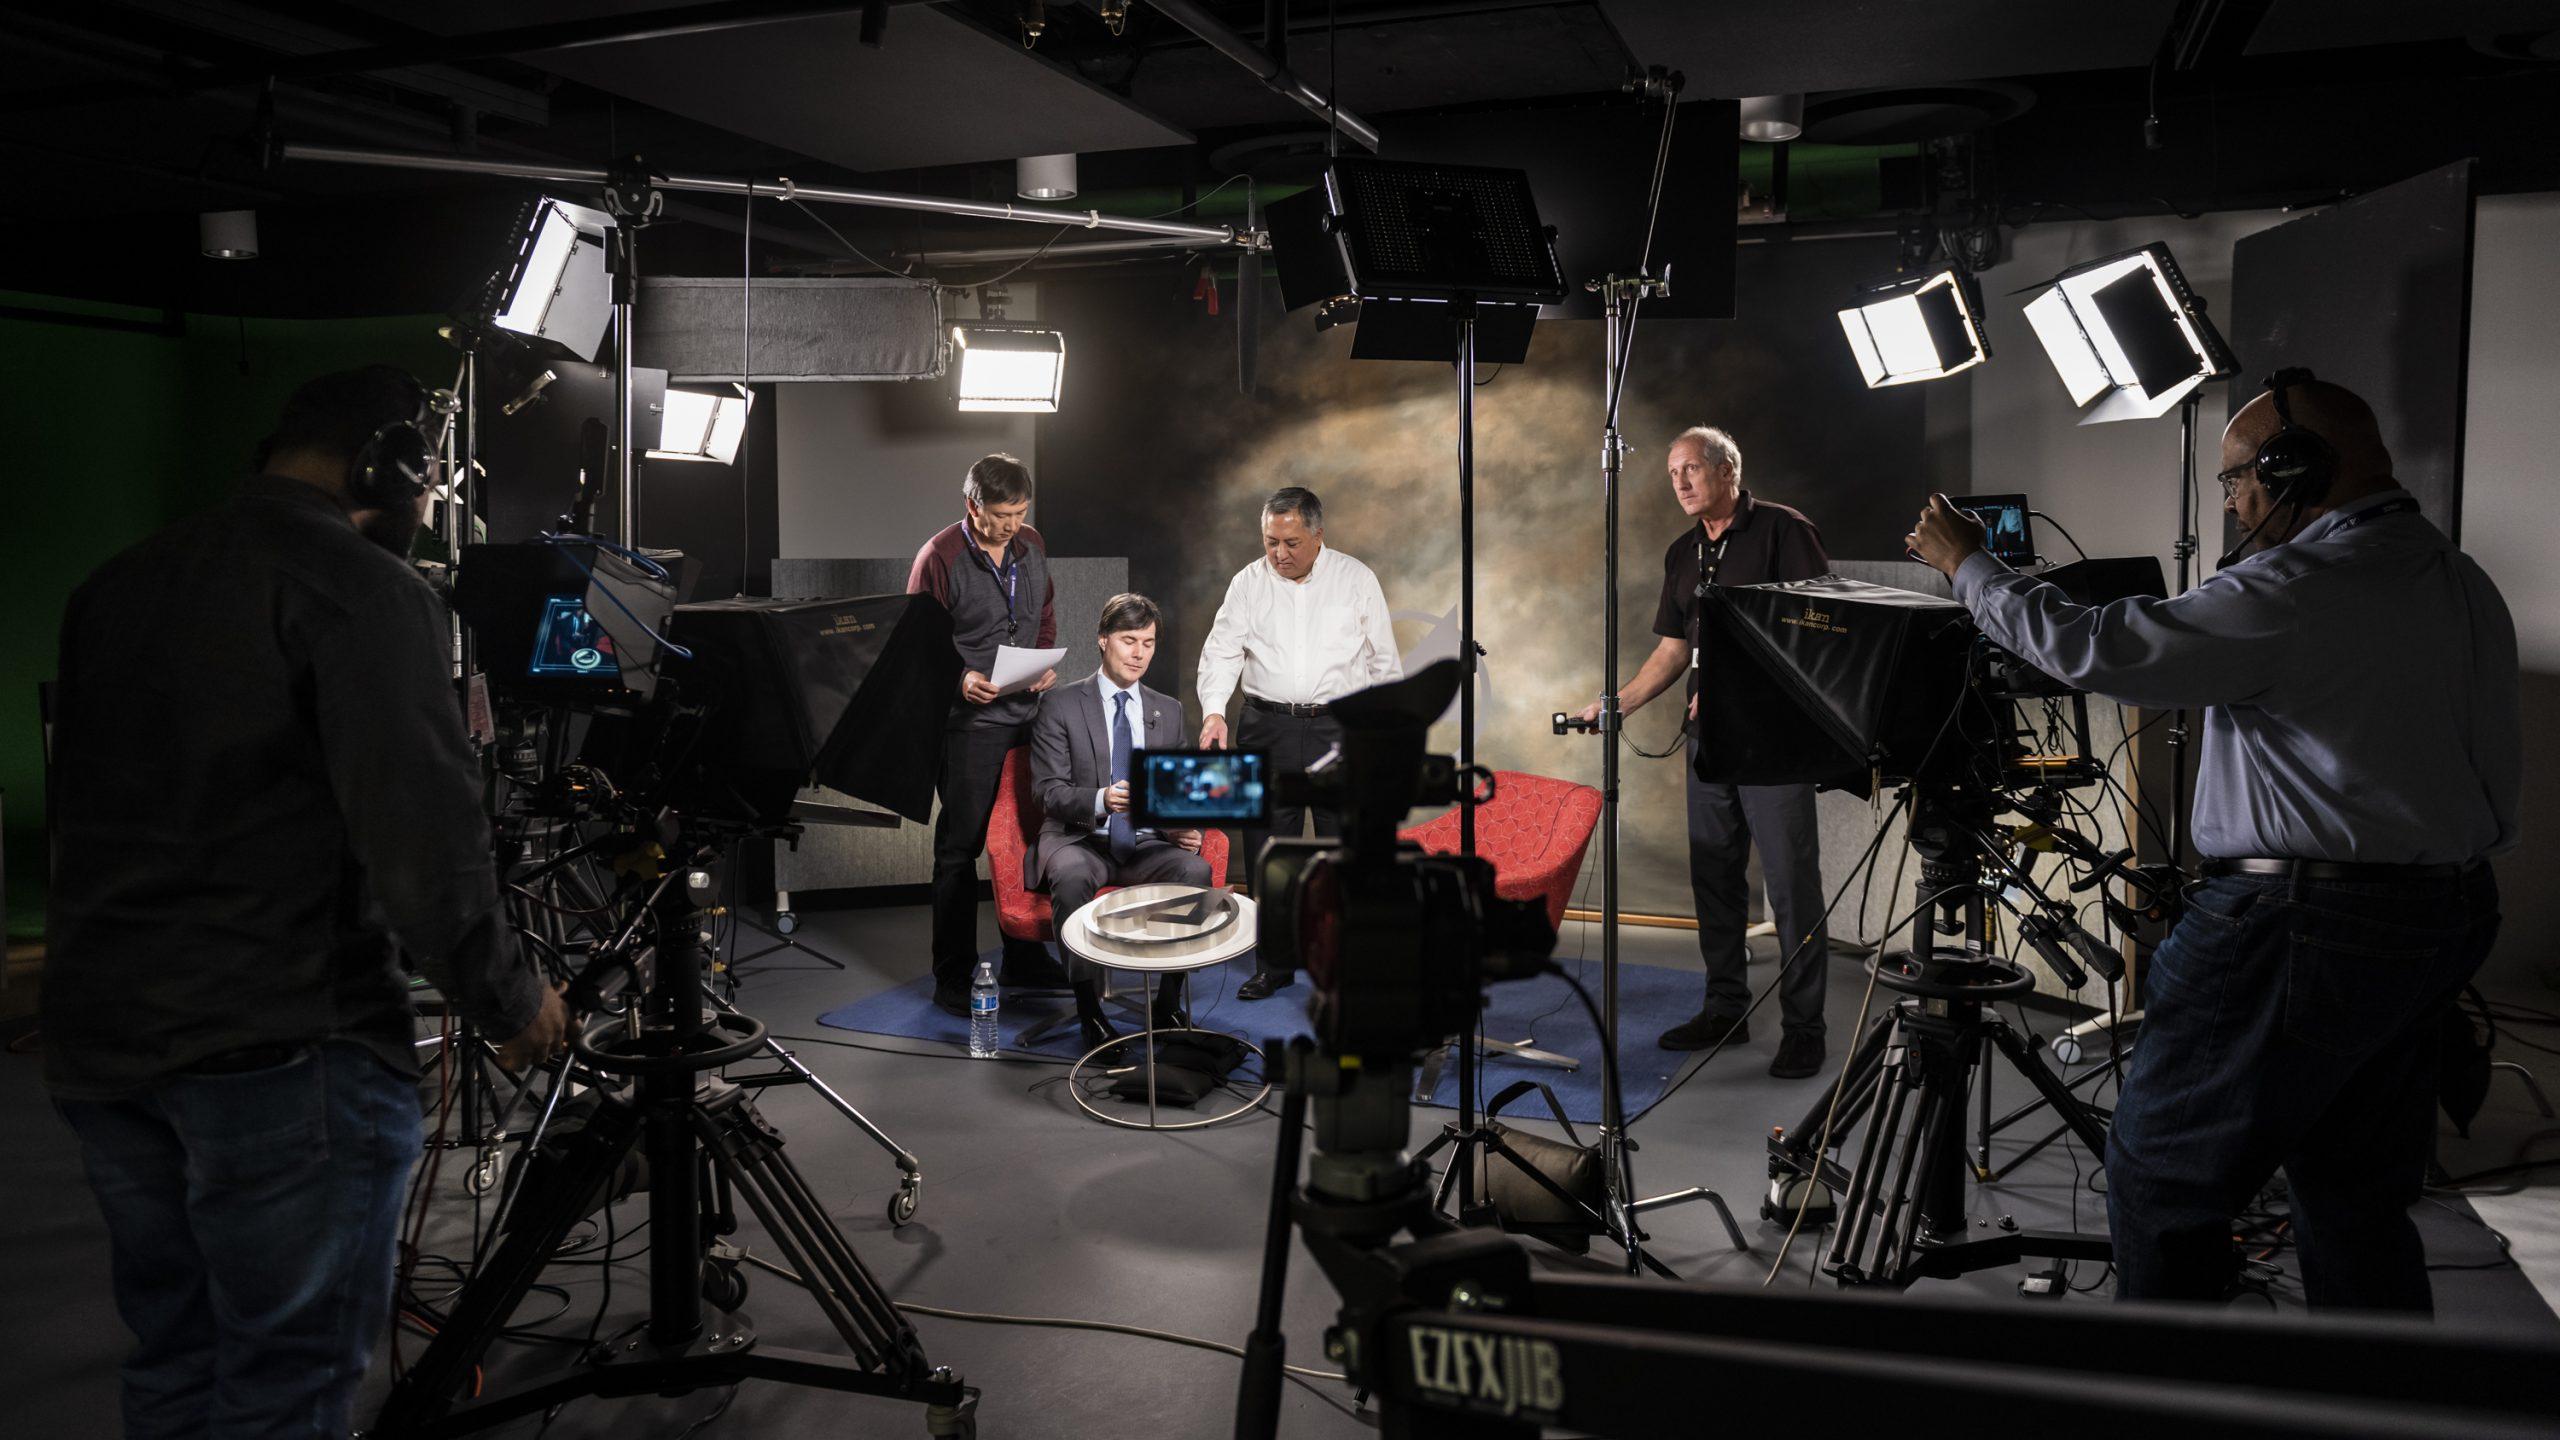 Aerospace Video Production Center Team